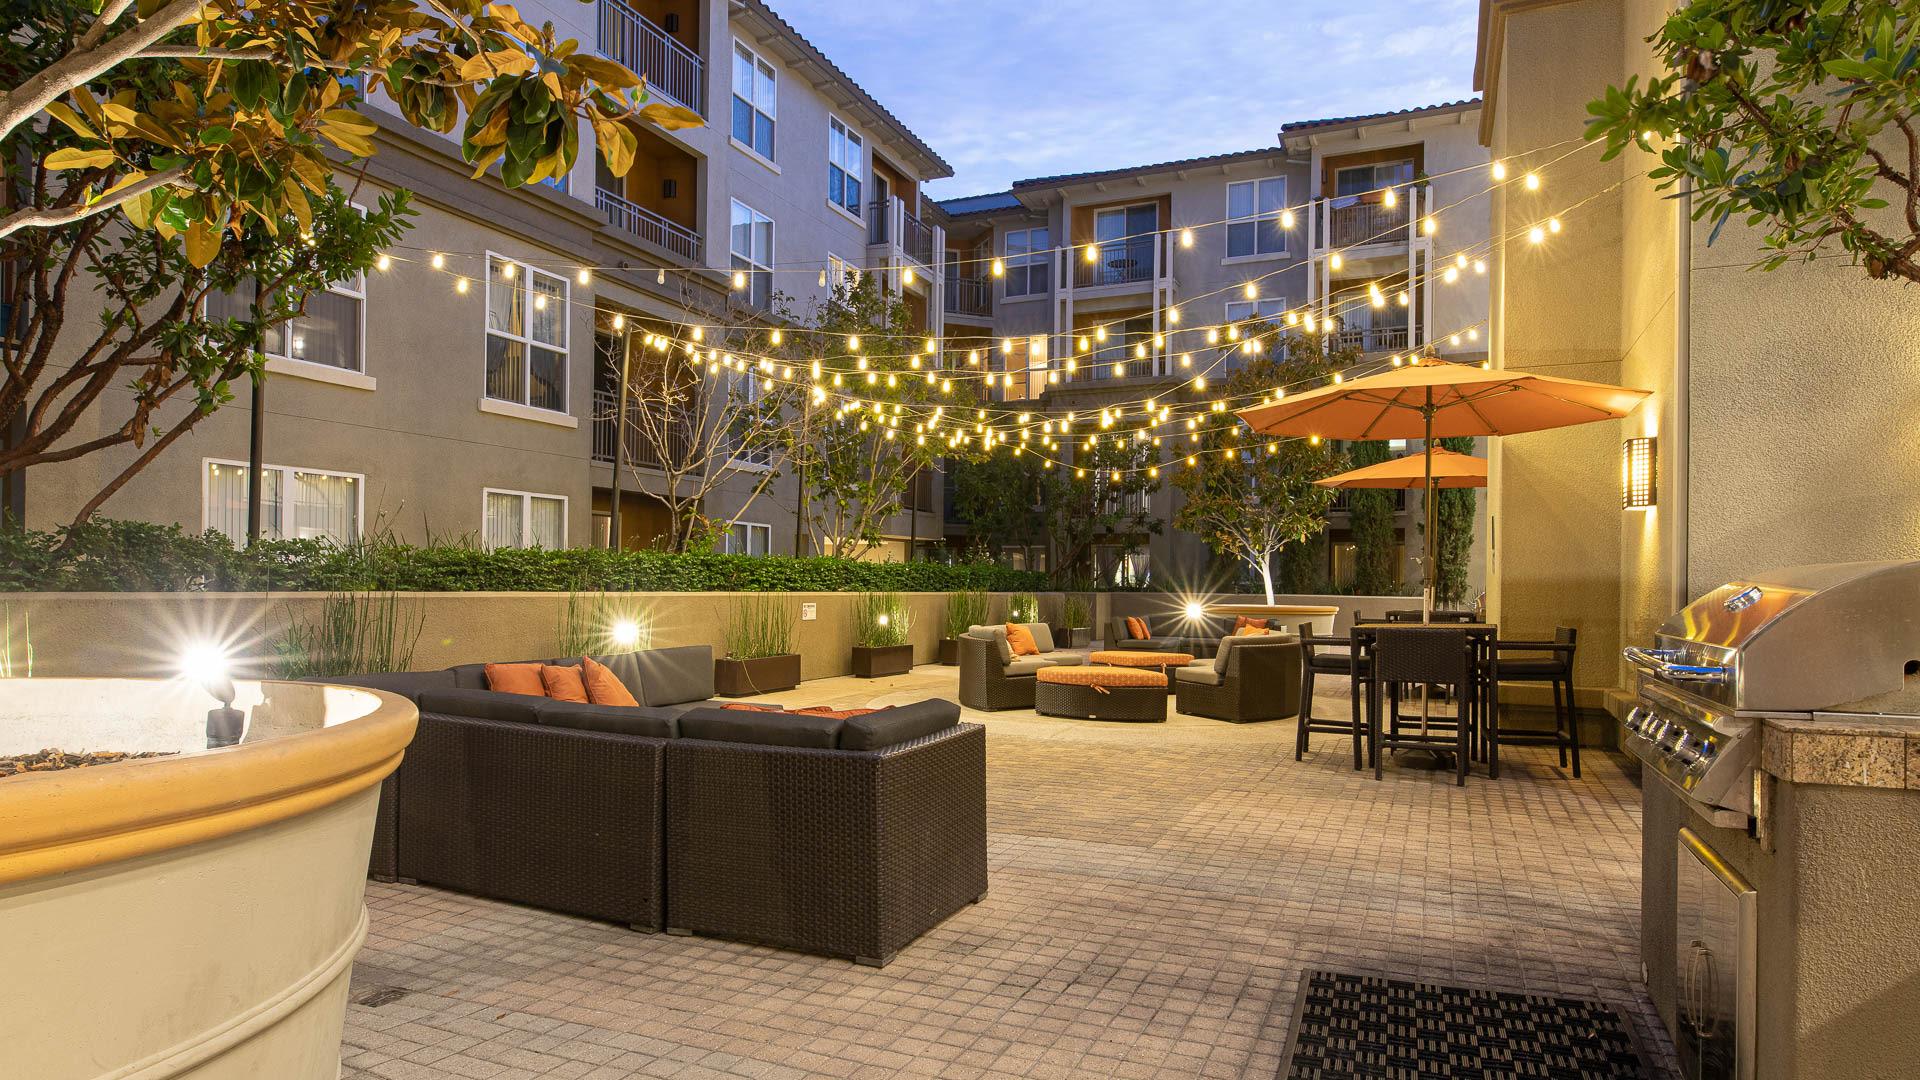 Acappella Pasadena Apartments - Courtyard